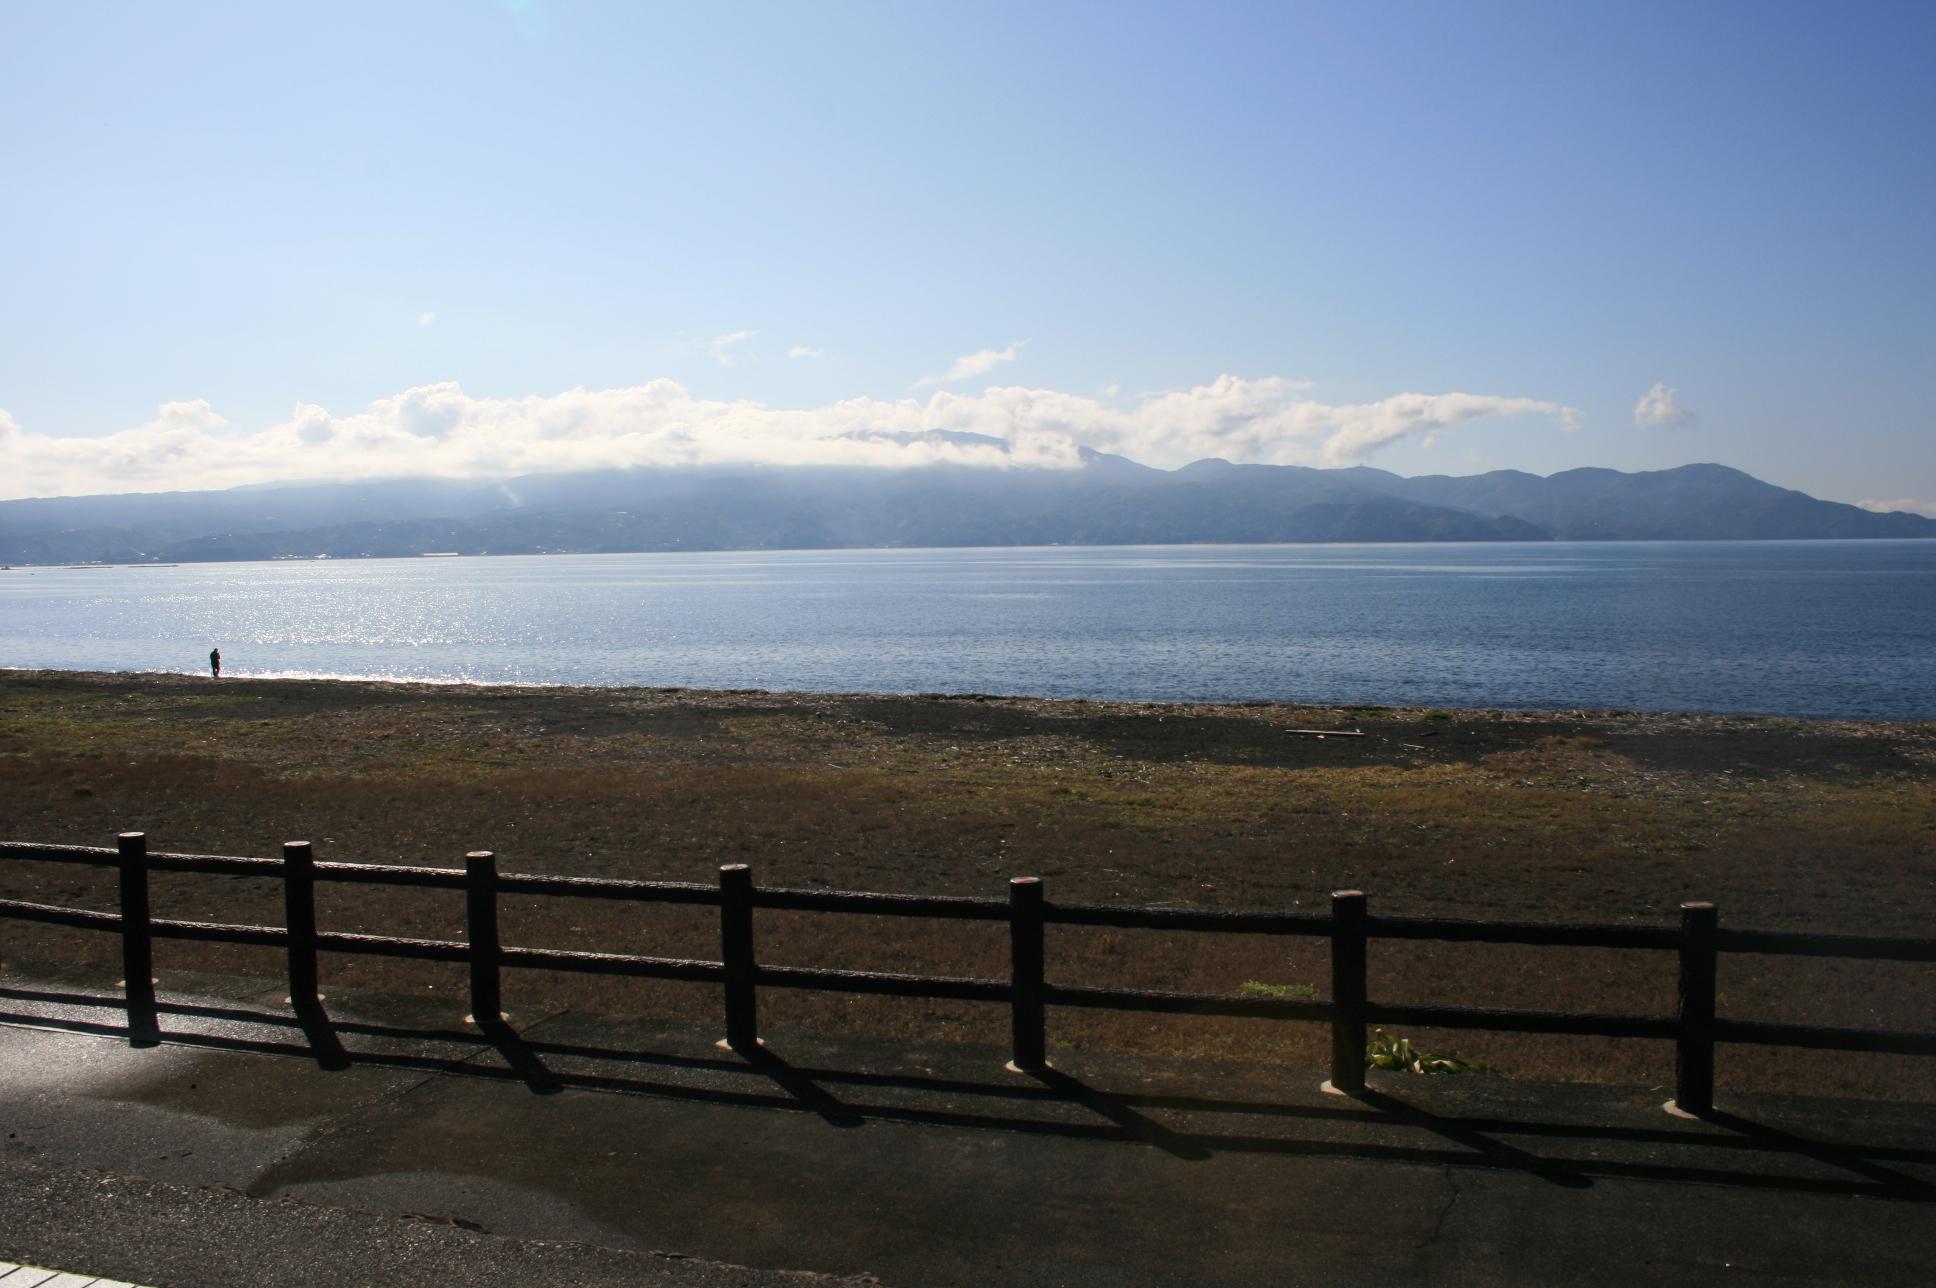 沼津御用邸記念公園〜沼津倶楽部〜日本最長400mの三島大吊橋で富士山を望む_1_1-2